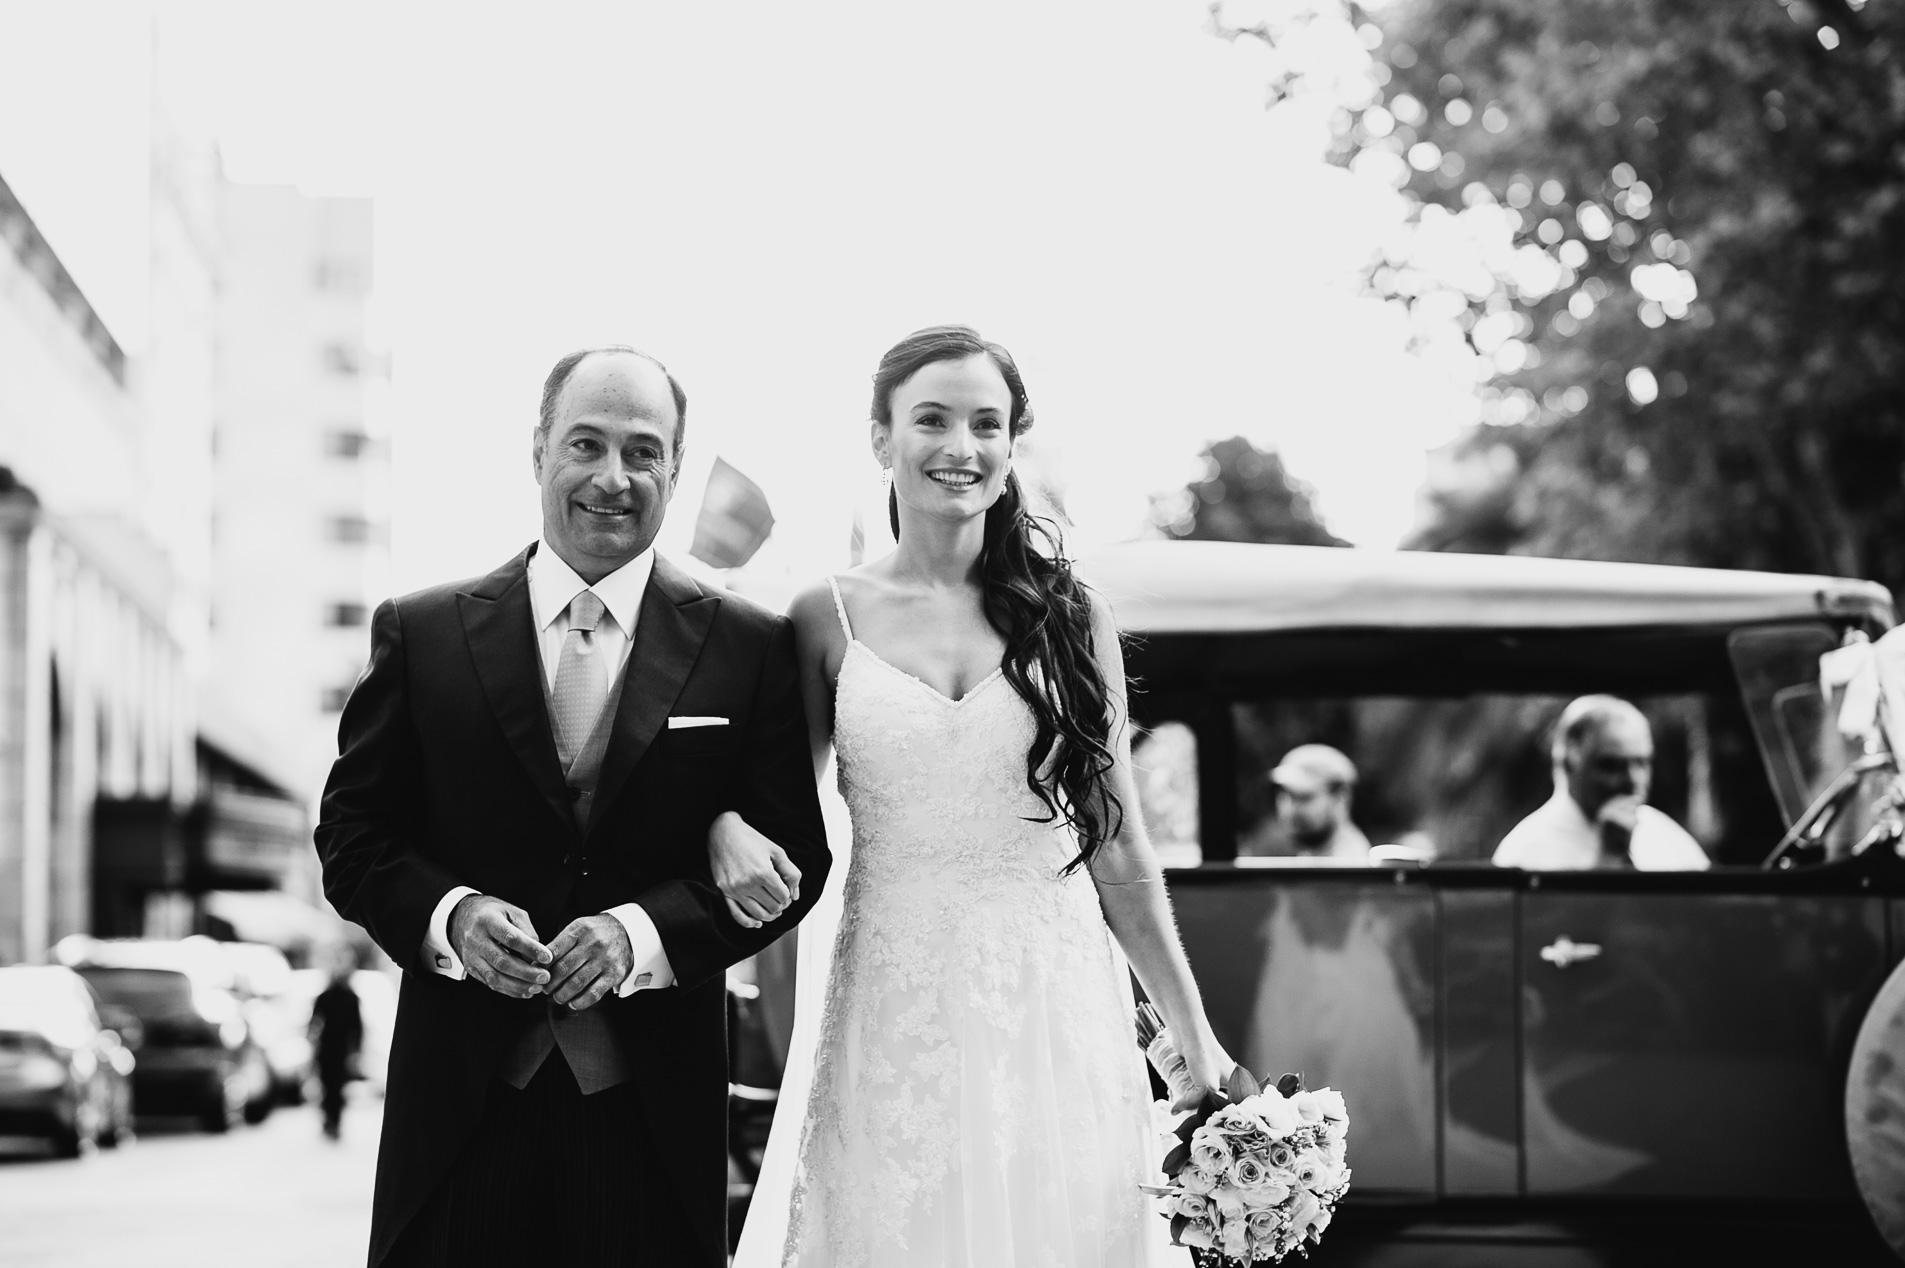 Dani-Cristian-fotos-matrimonio-16